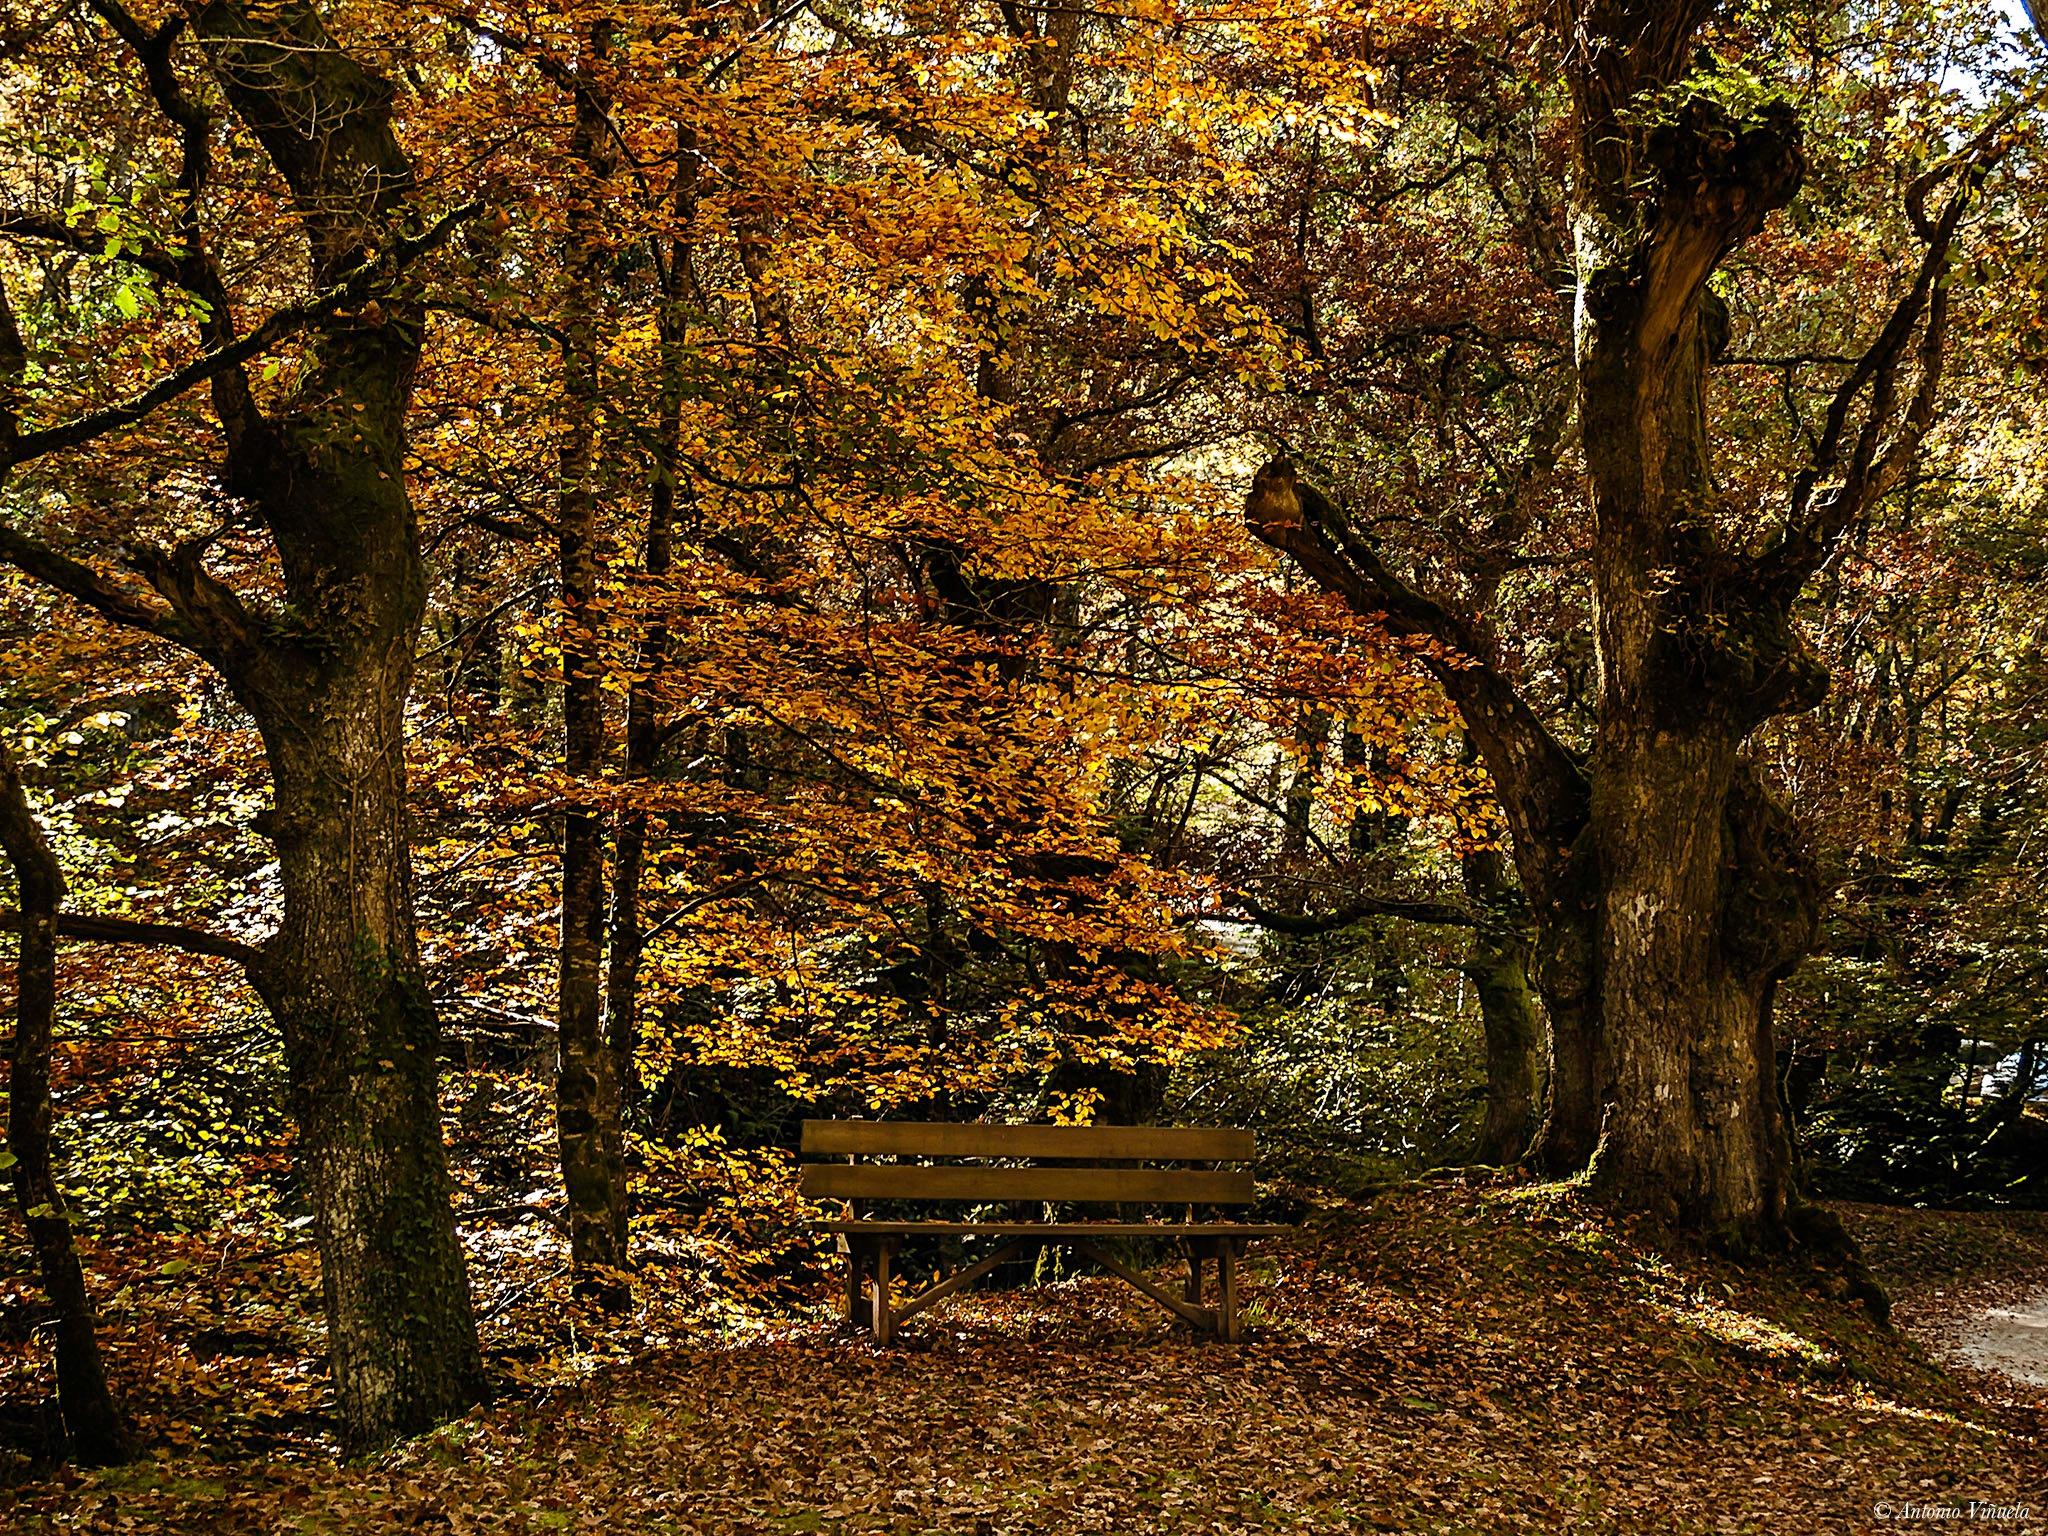 Autumnal colors by Antonio Viñuela